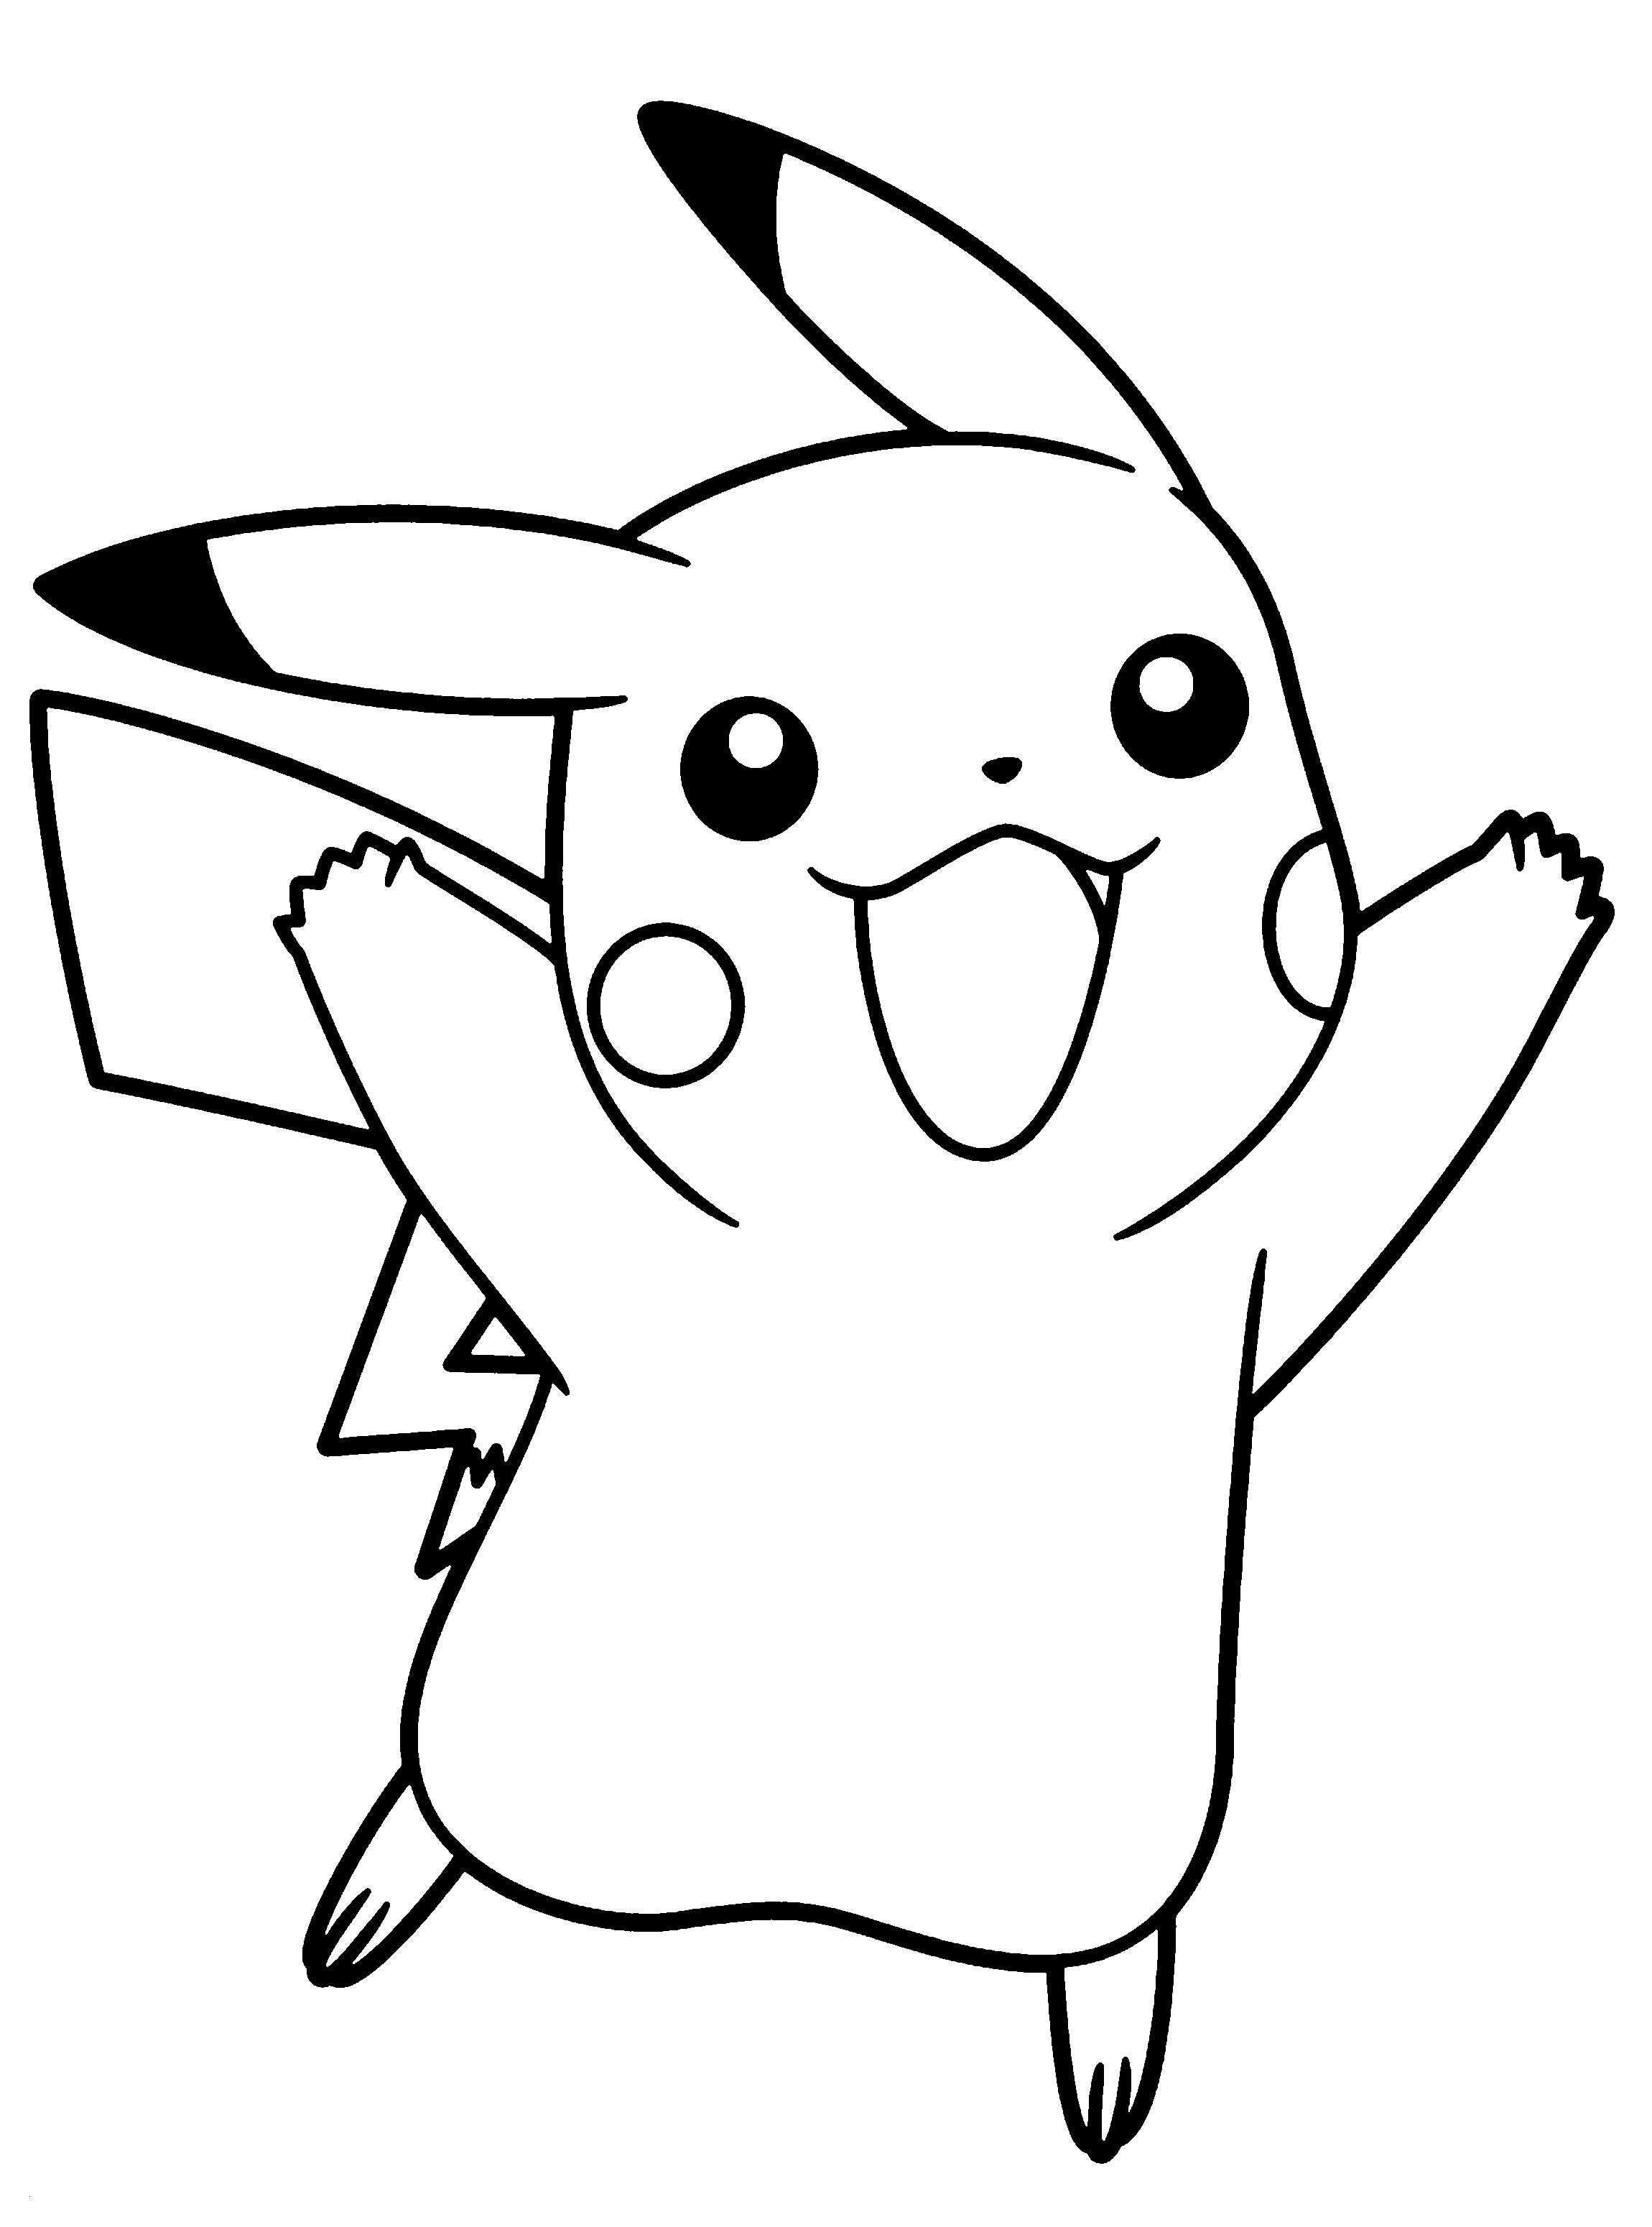 Ausmalbilder Pokemon Ball Neu 24 Pikachu Coloring Pages Gallery Coloring Sheets Fotos